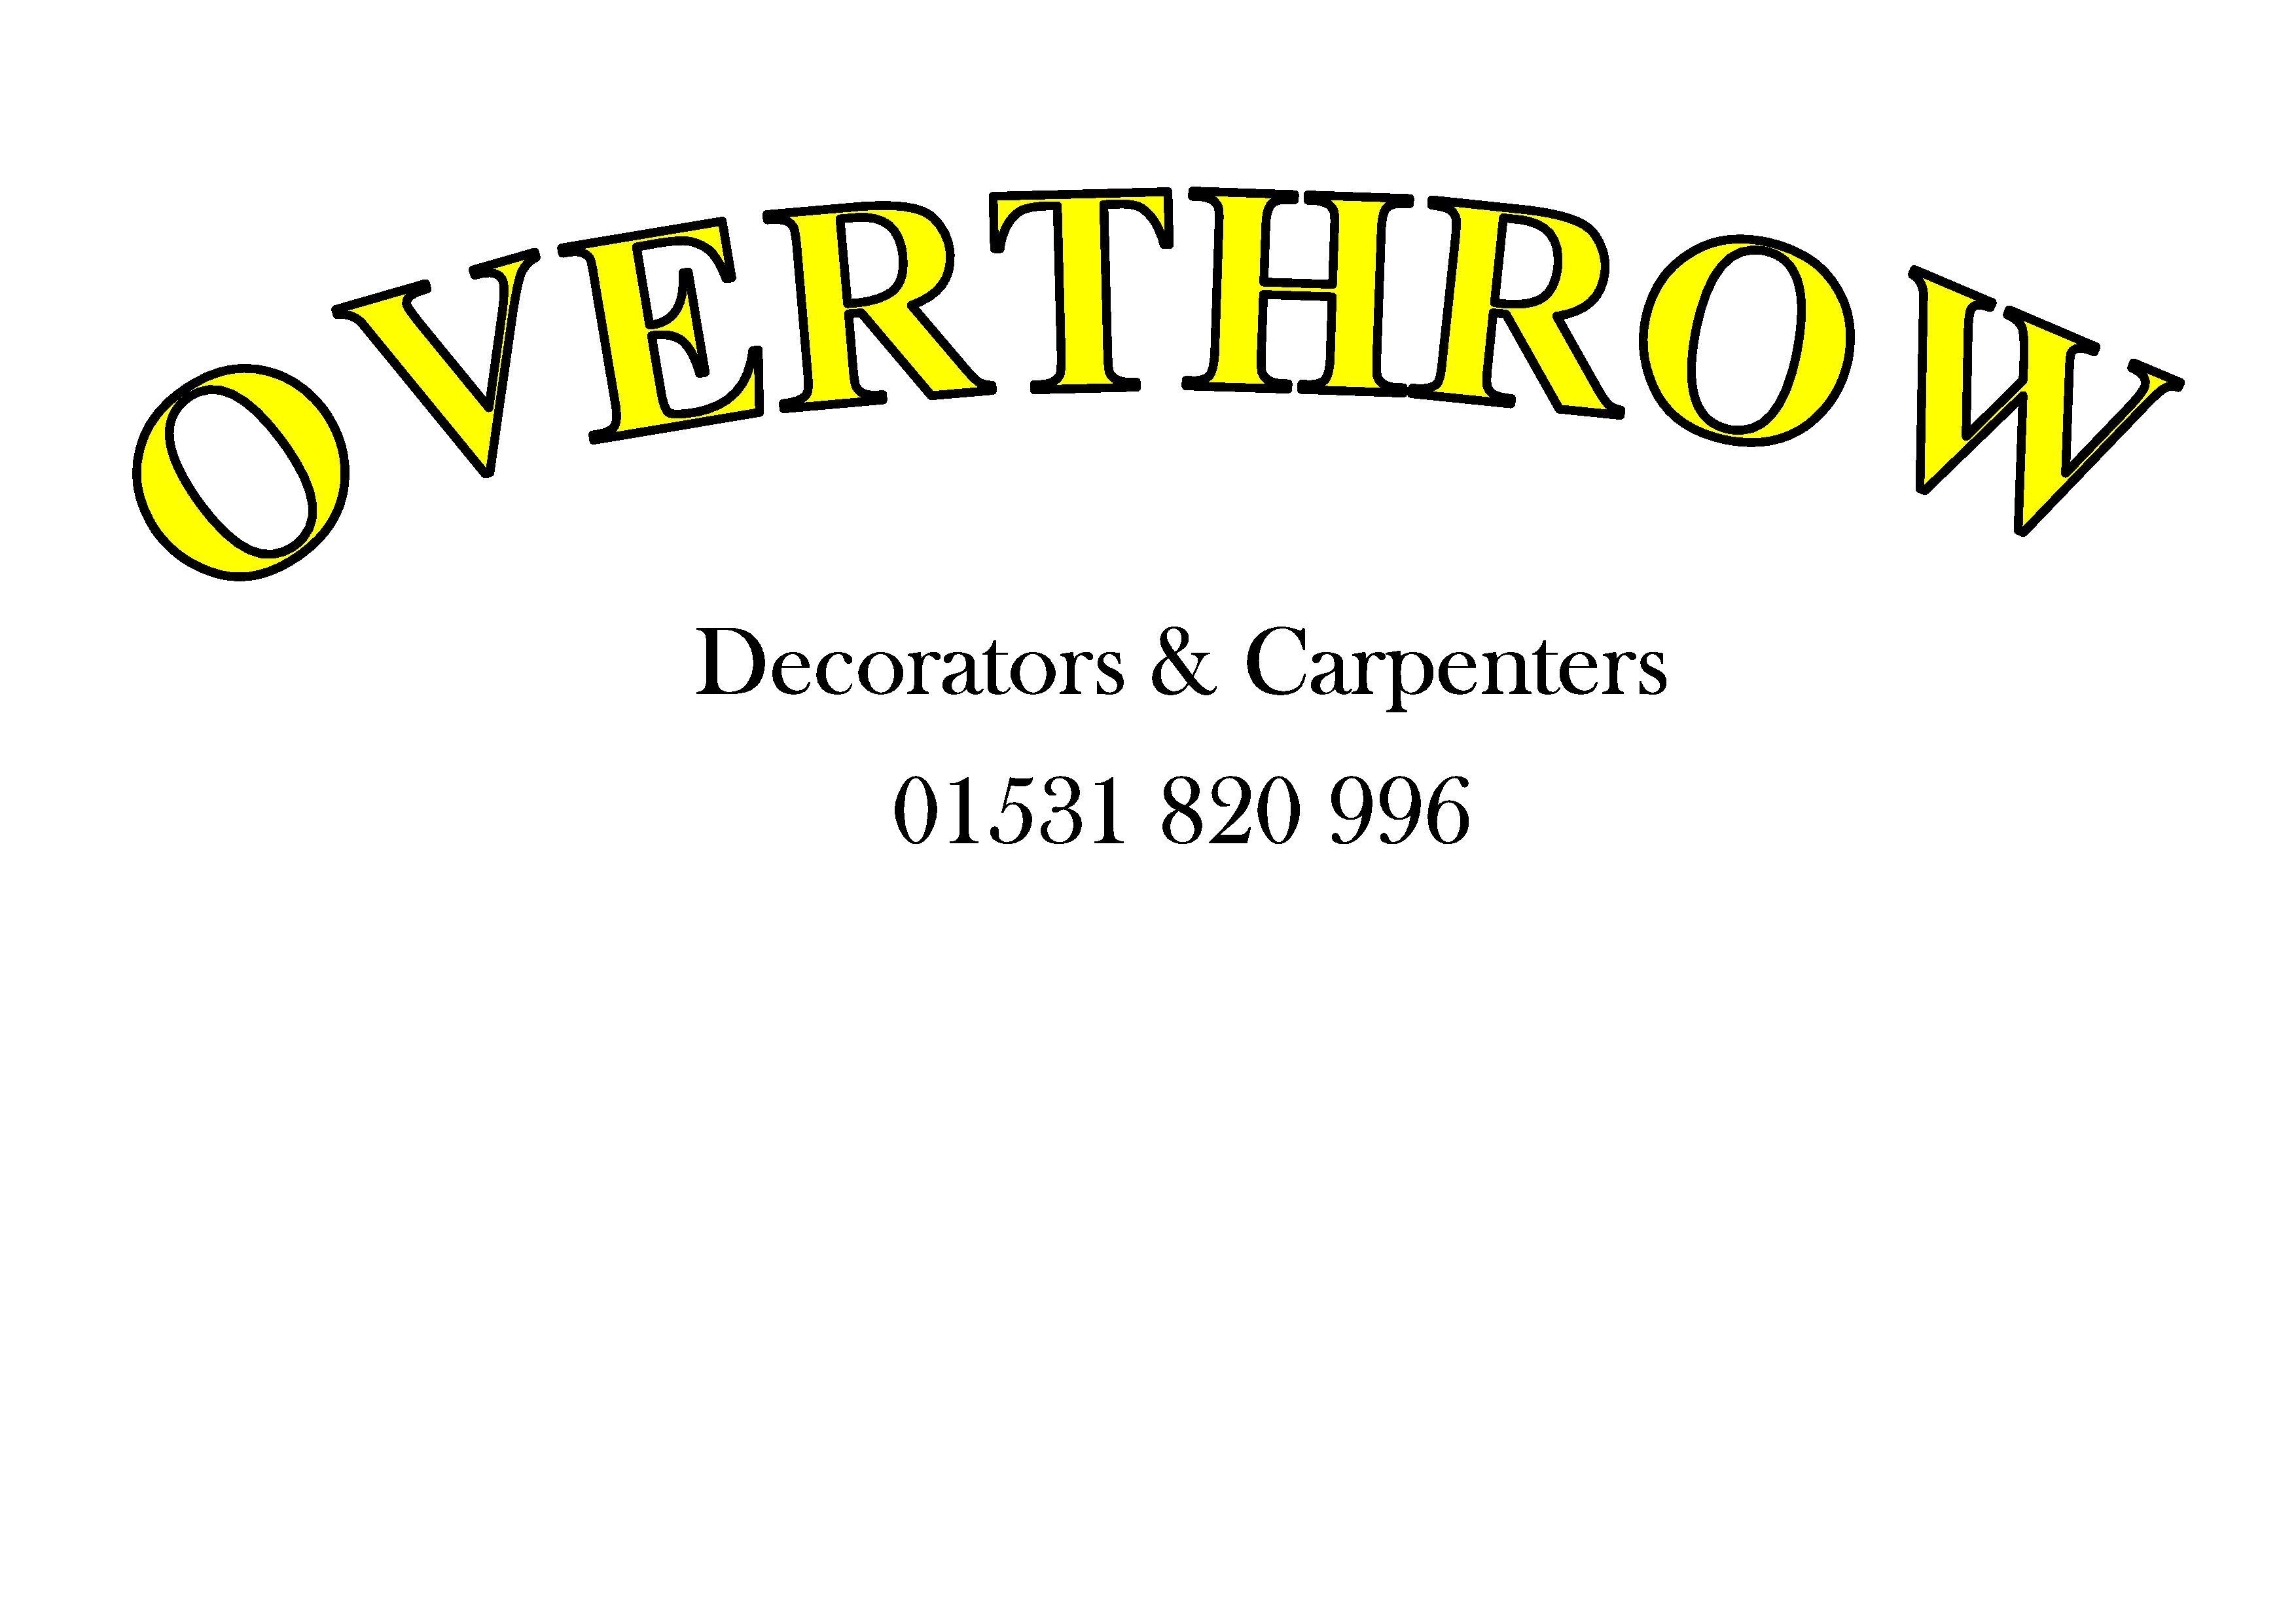 Overthrow Decorators and Carpenters